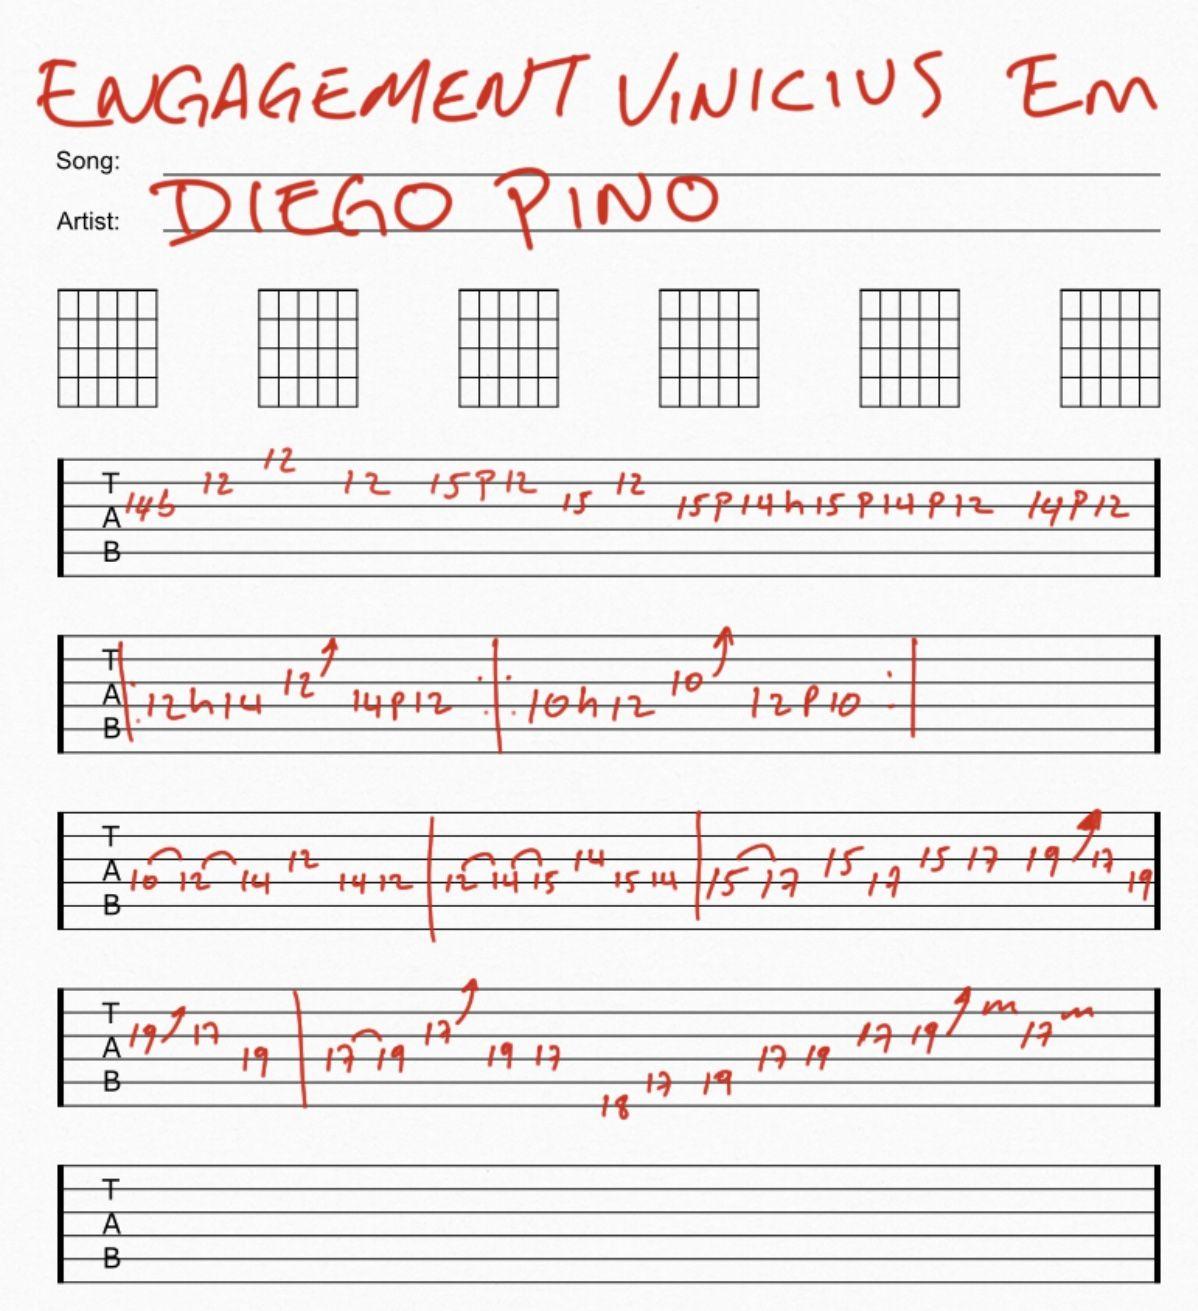 [Image: Engagement-Vinicius-Em.jpeg]